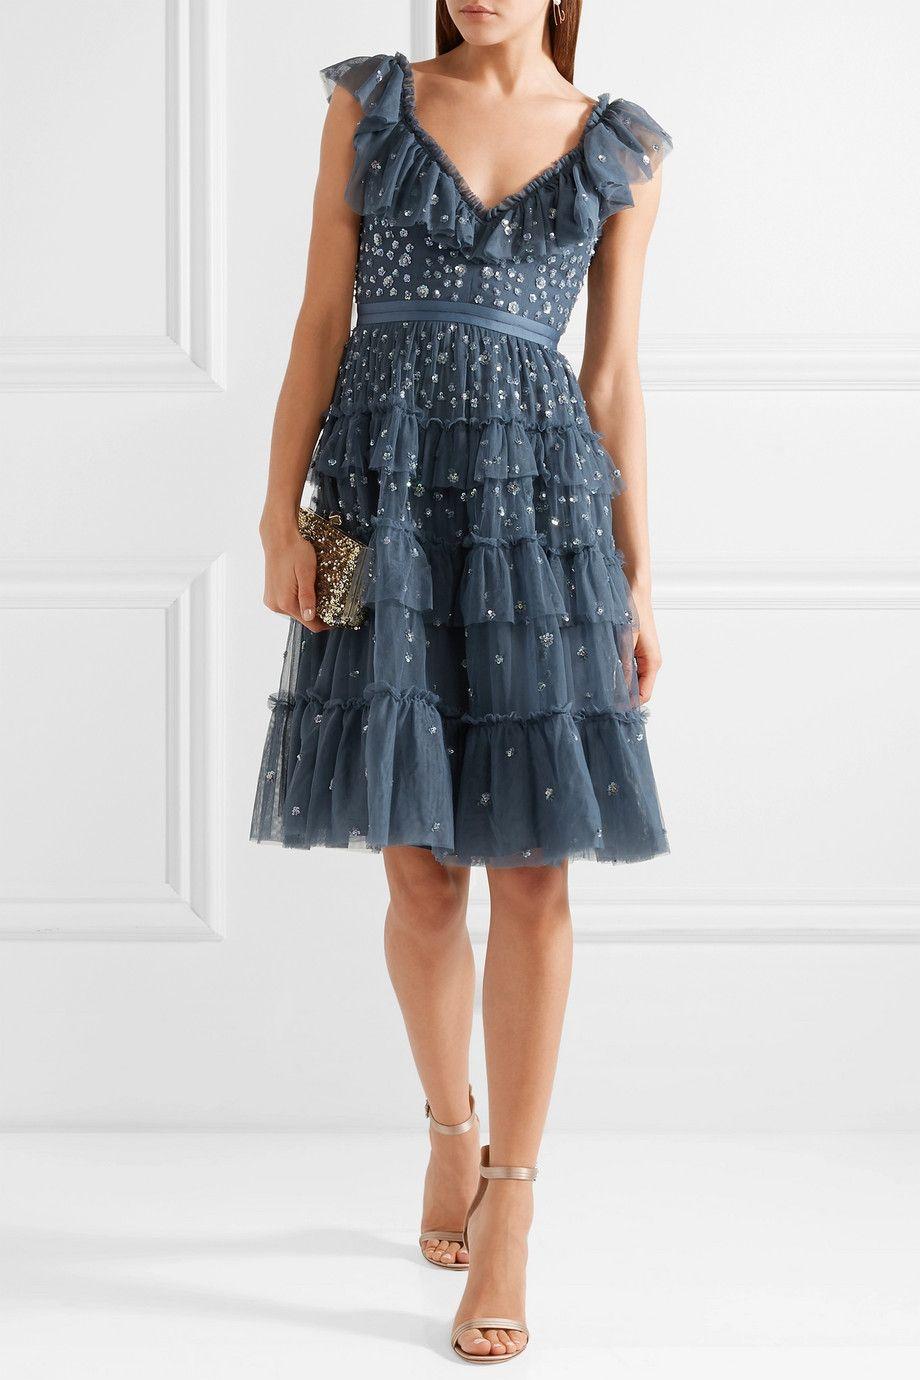 Sunburst Tiered Embellished Ruffle-trimmed Tulle Midi Dress - Storm blue Needle & Thread 3MKXTgY